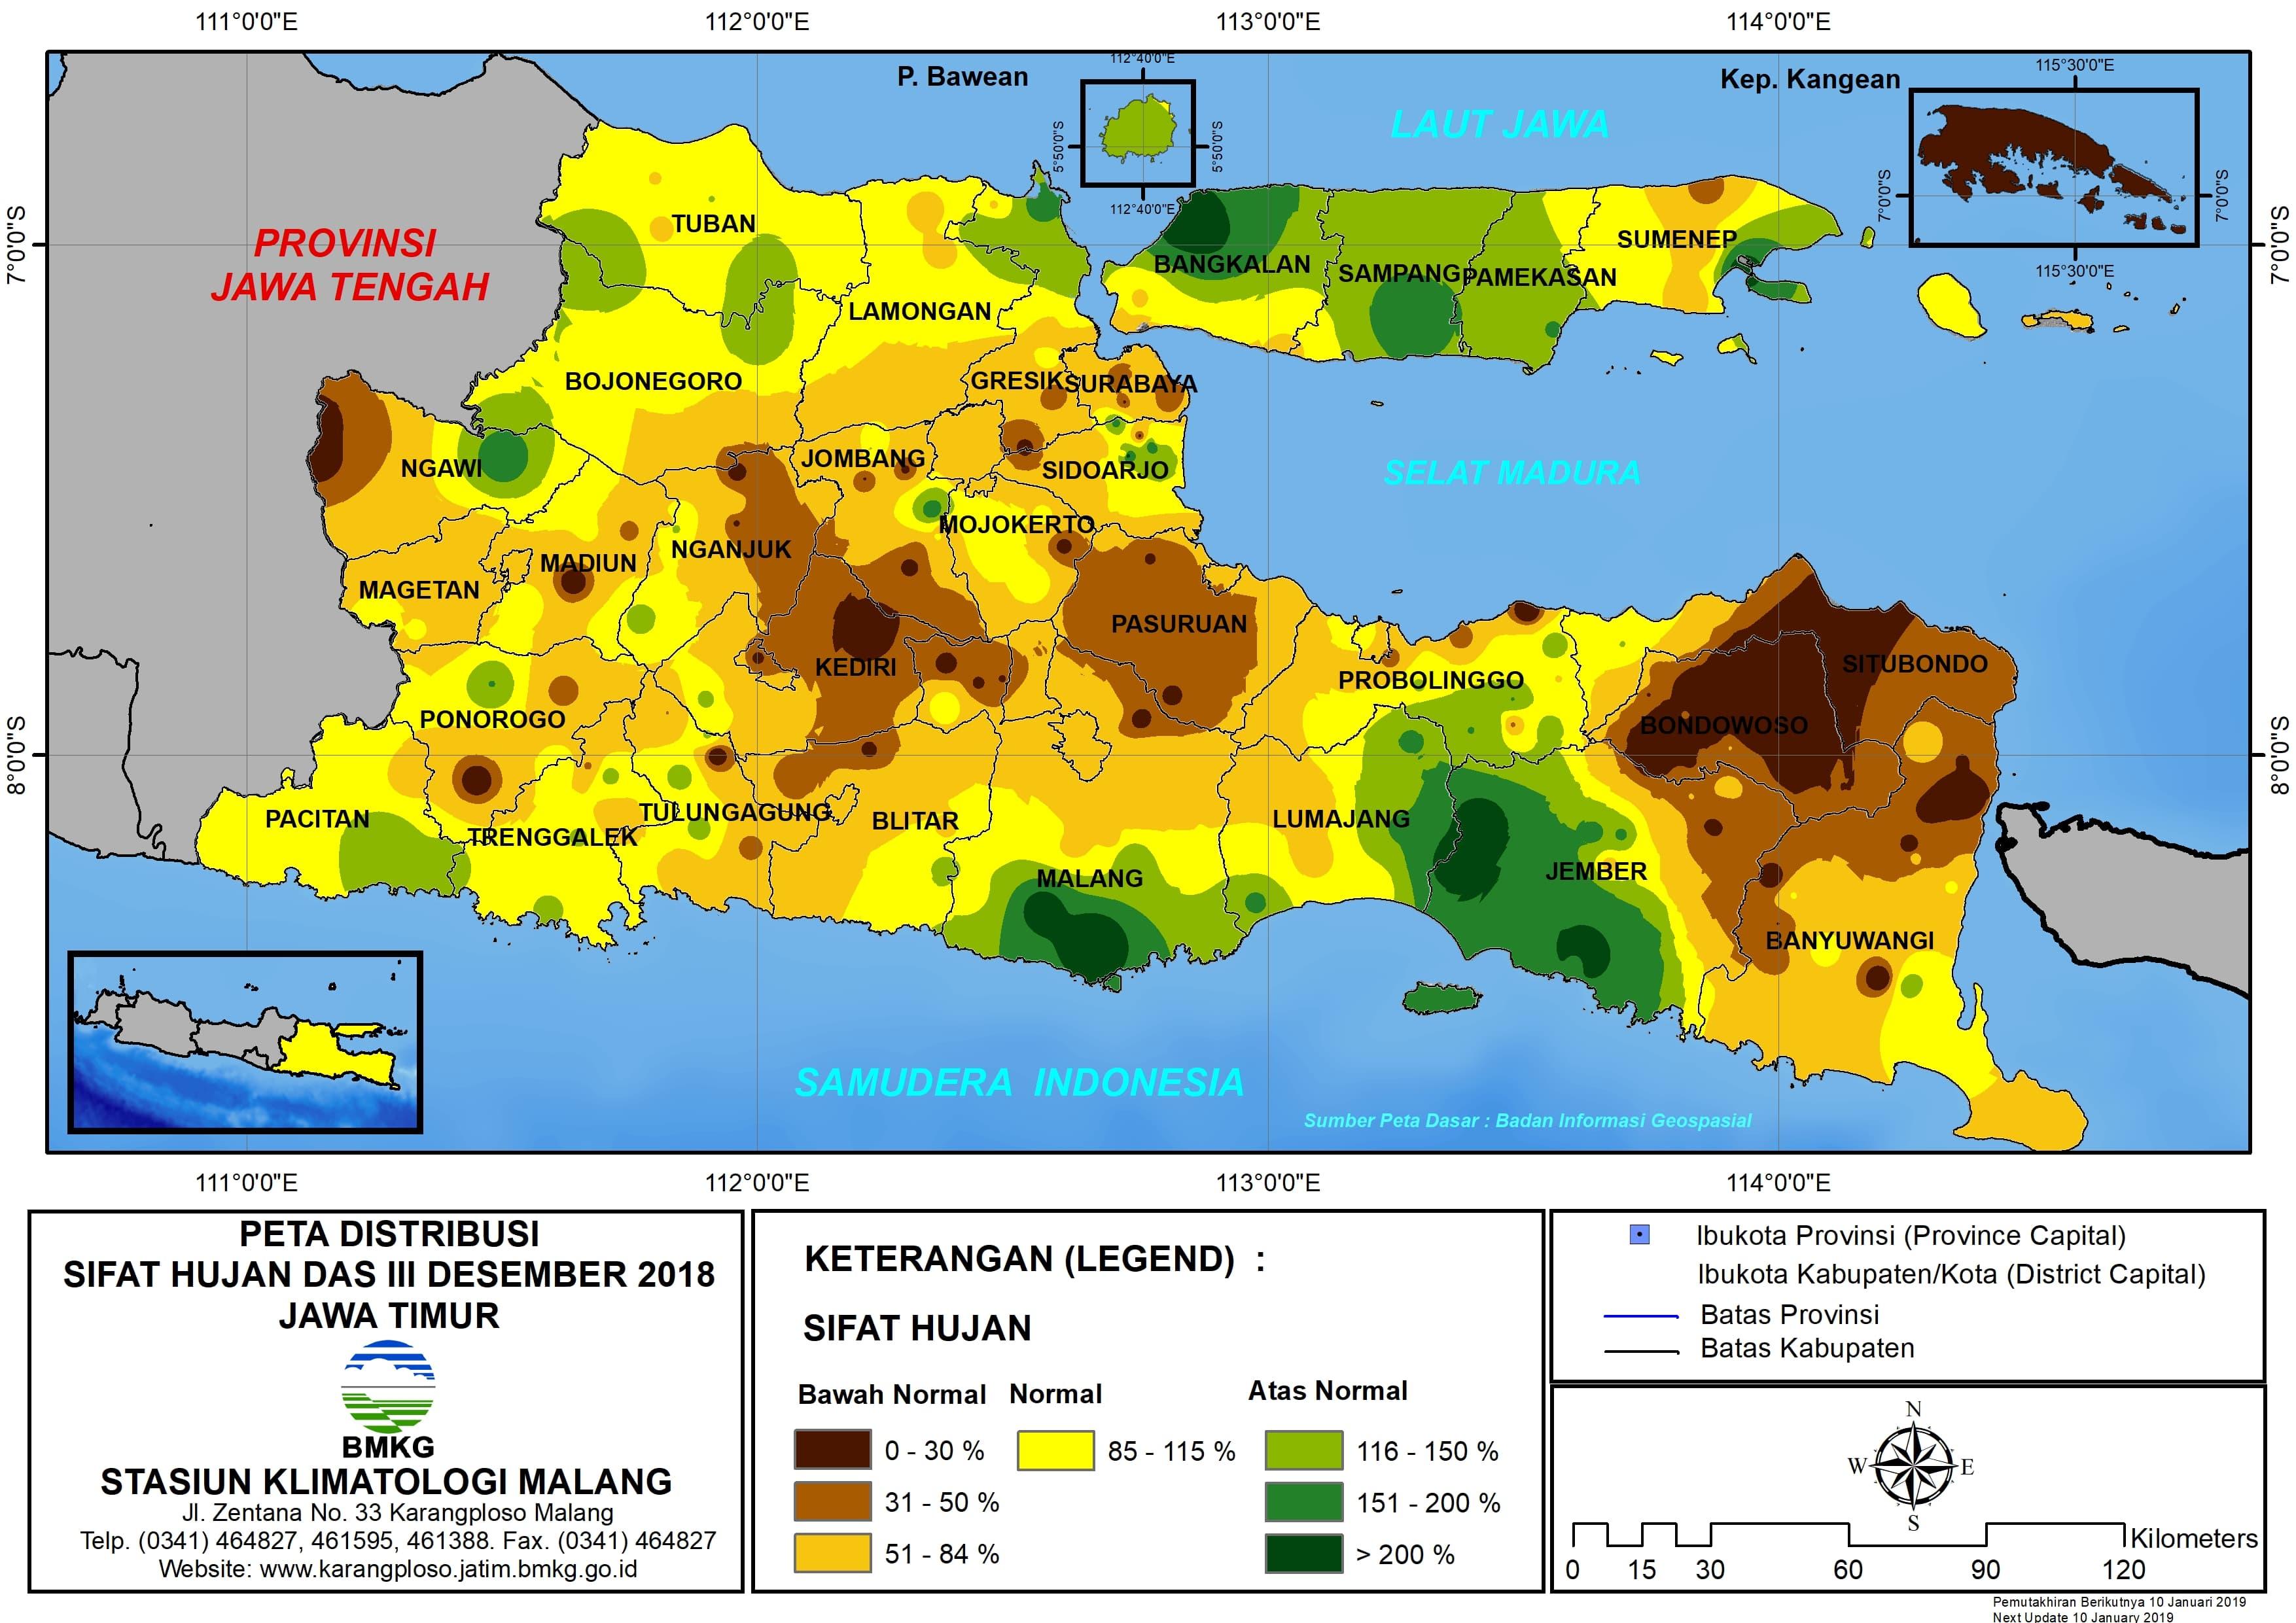 Peta Analisis Distribusi Sifat Hujan Dasarian III Desember 2018 di Provinsi Jawa Timur